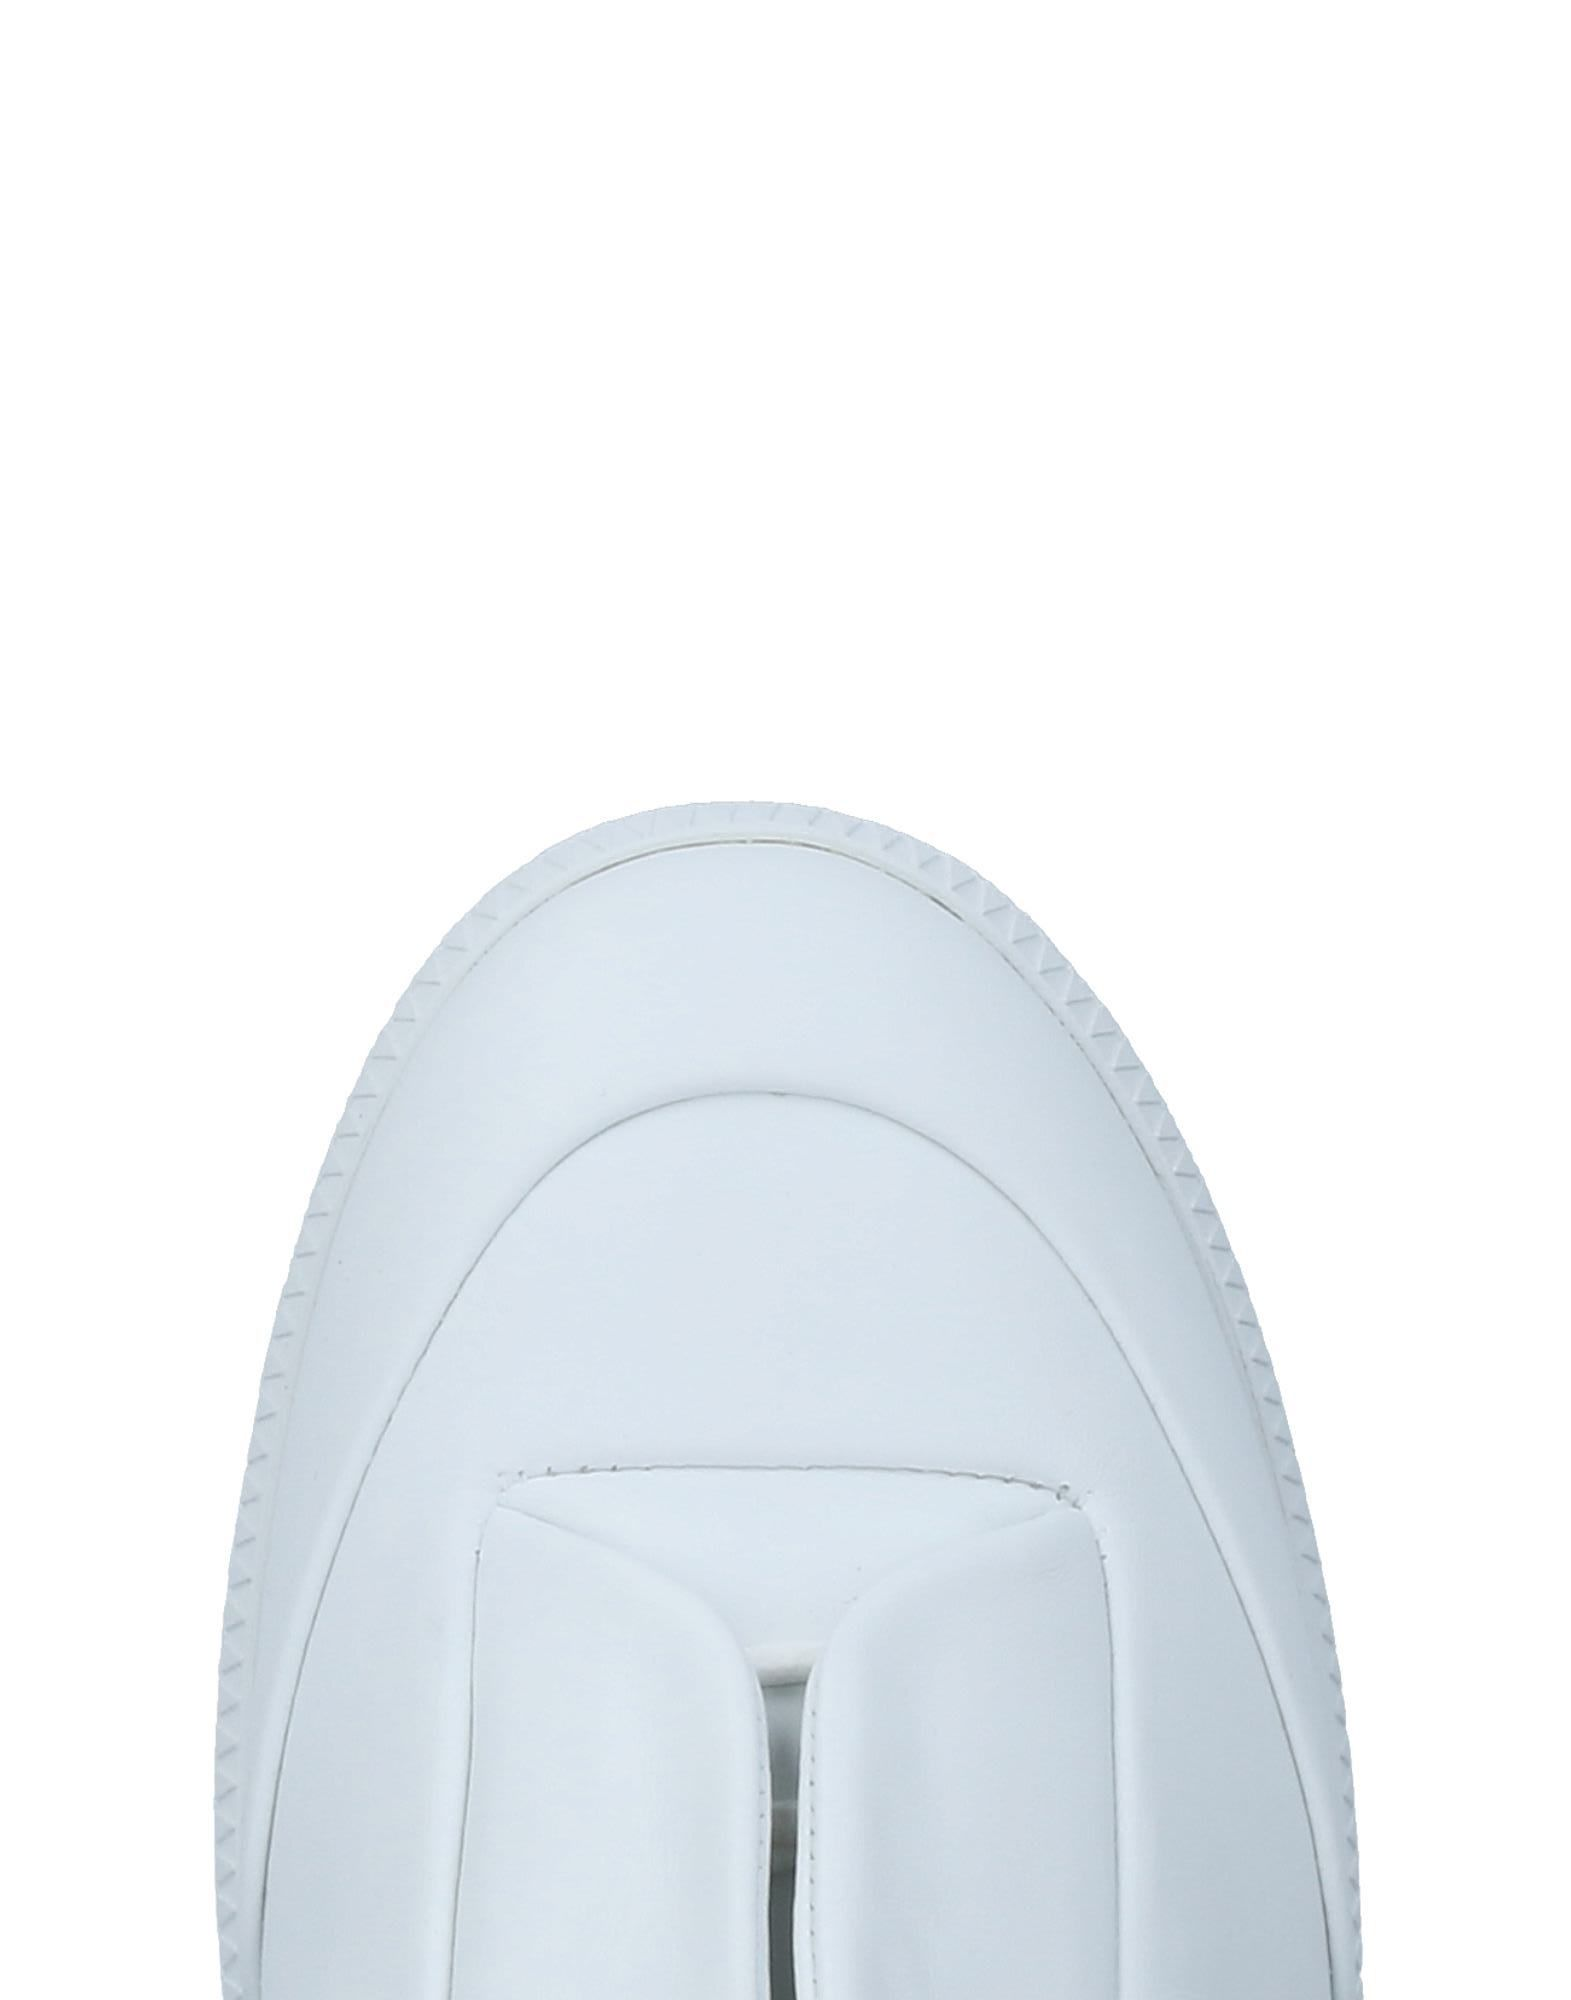 Maison Margiela Sneakers Herren  11471953JV Gute Qualität beliebte Schuhe